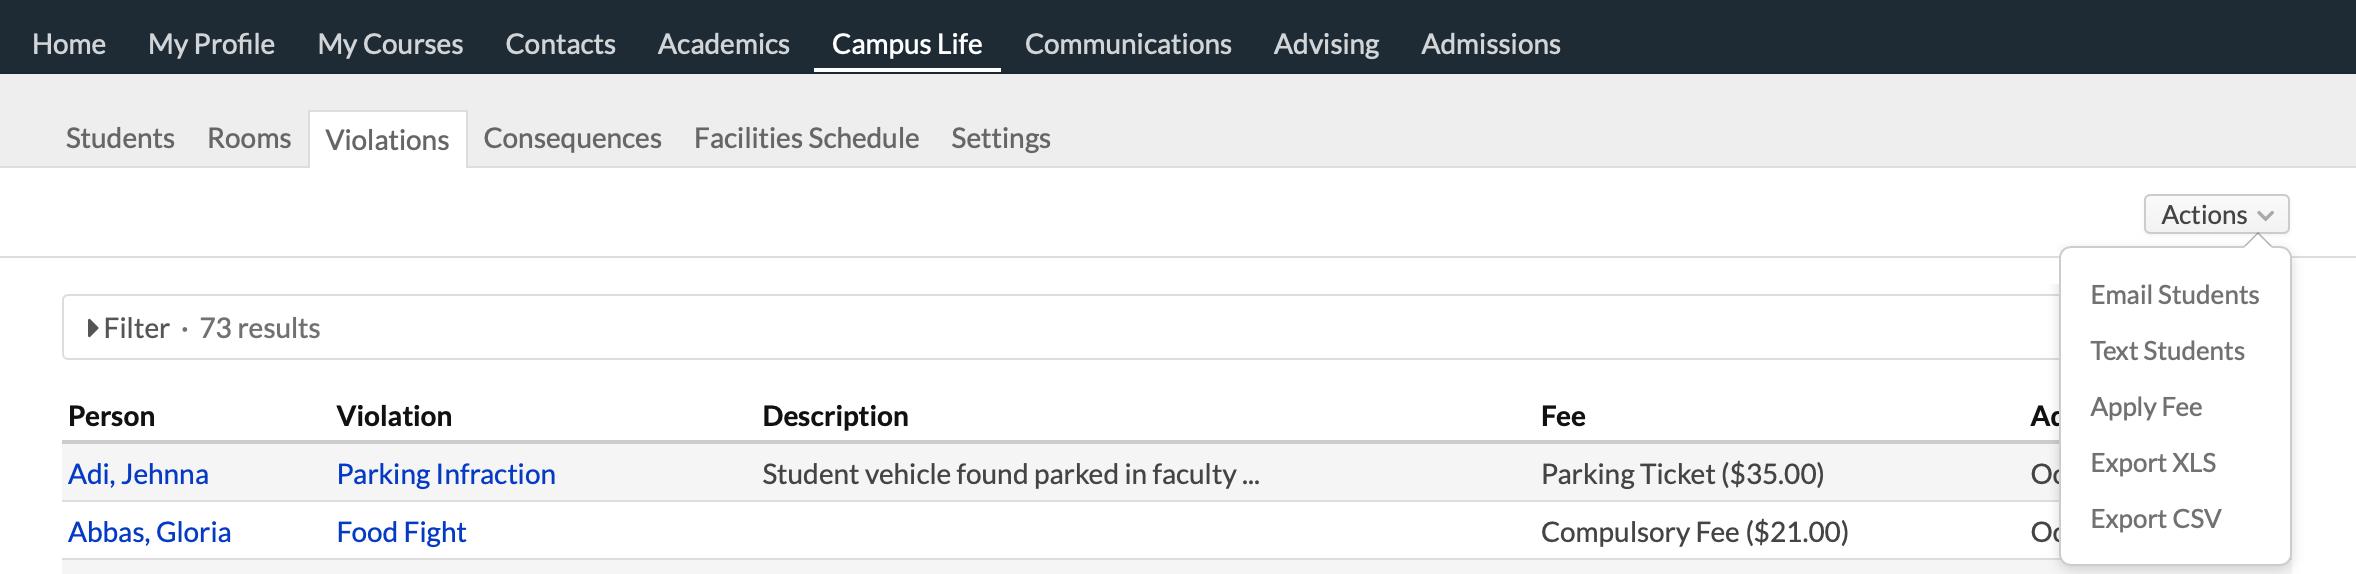 campus_life_violations